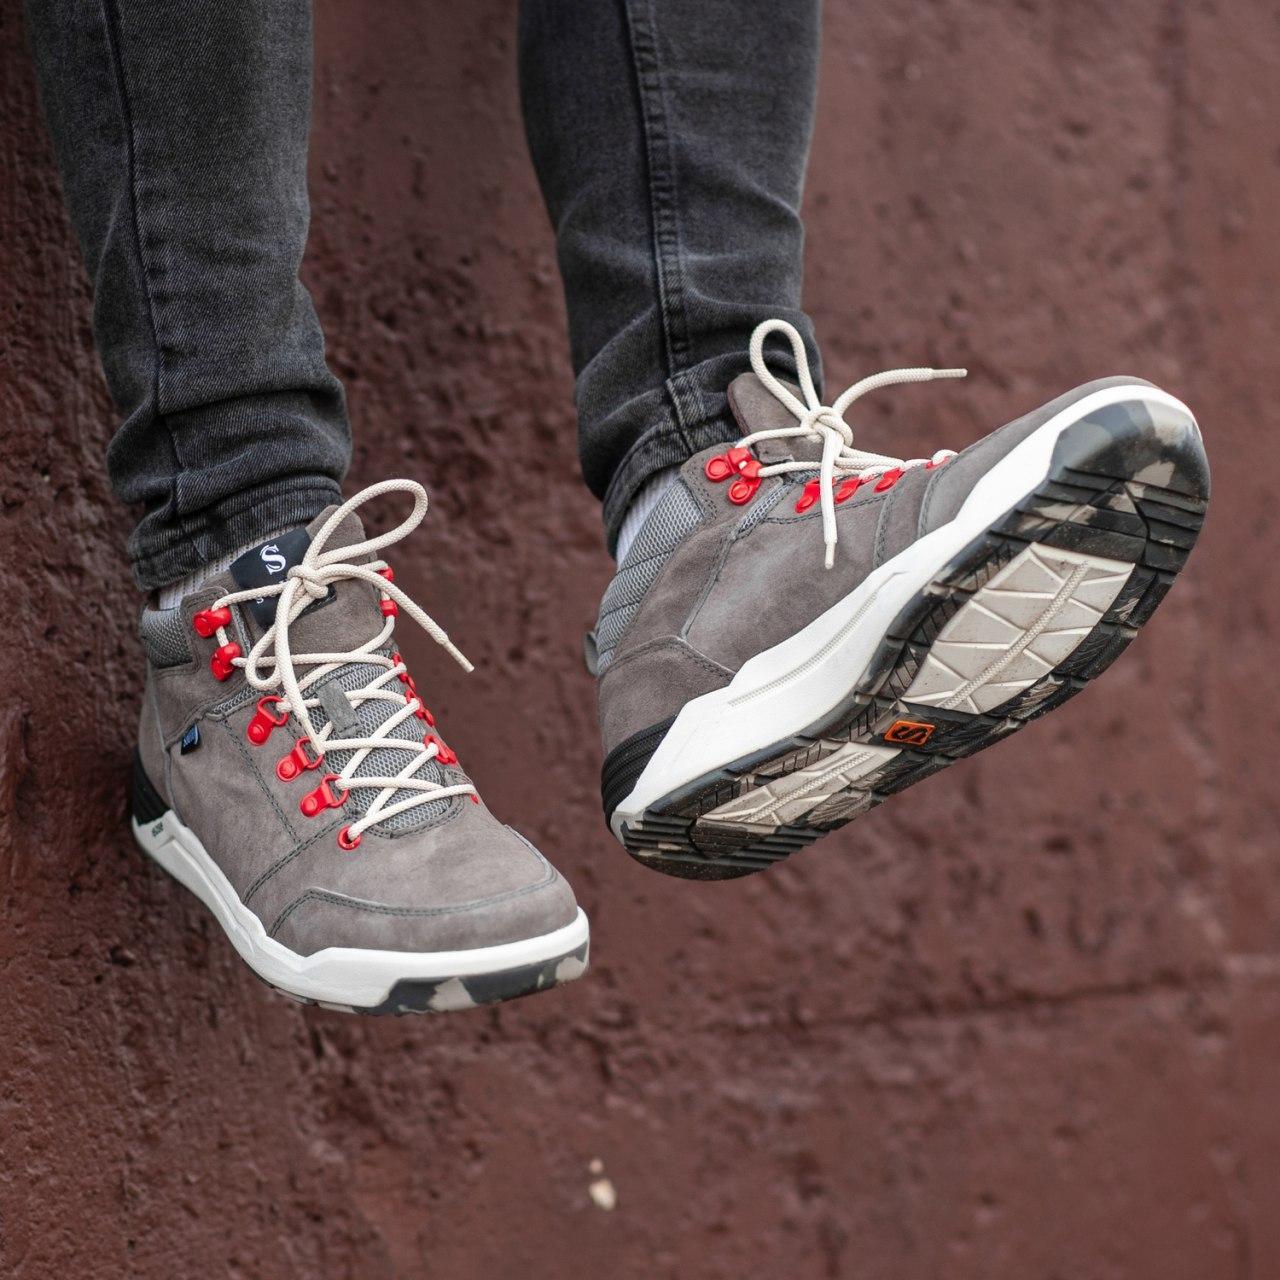 Ботинки South fenix grey - фото 2